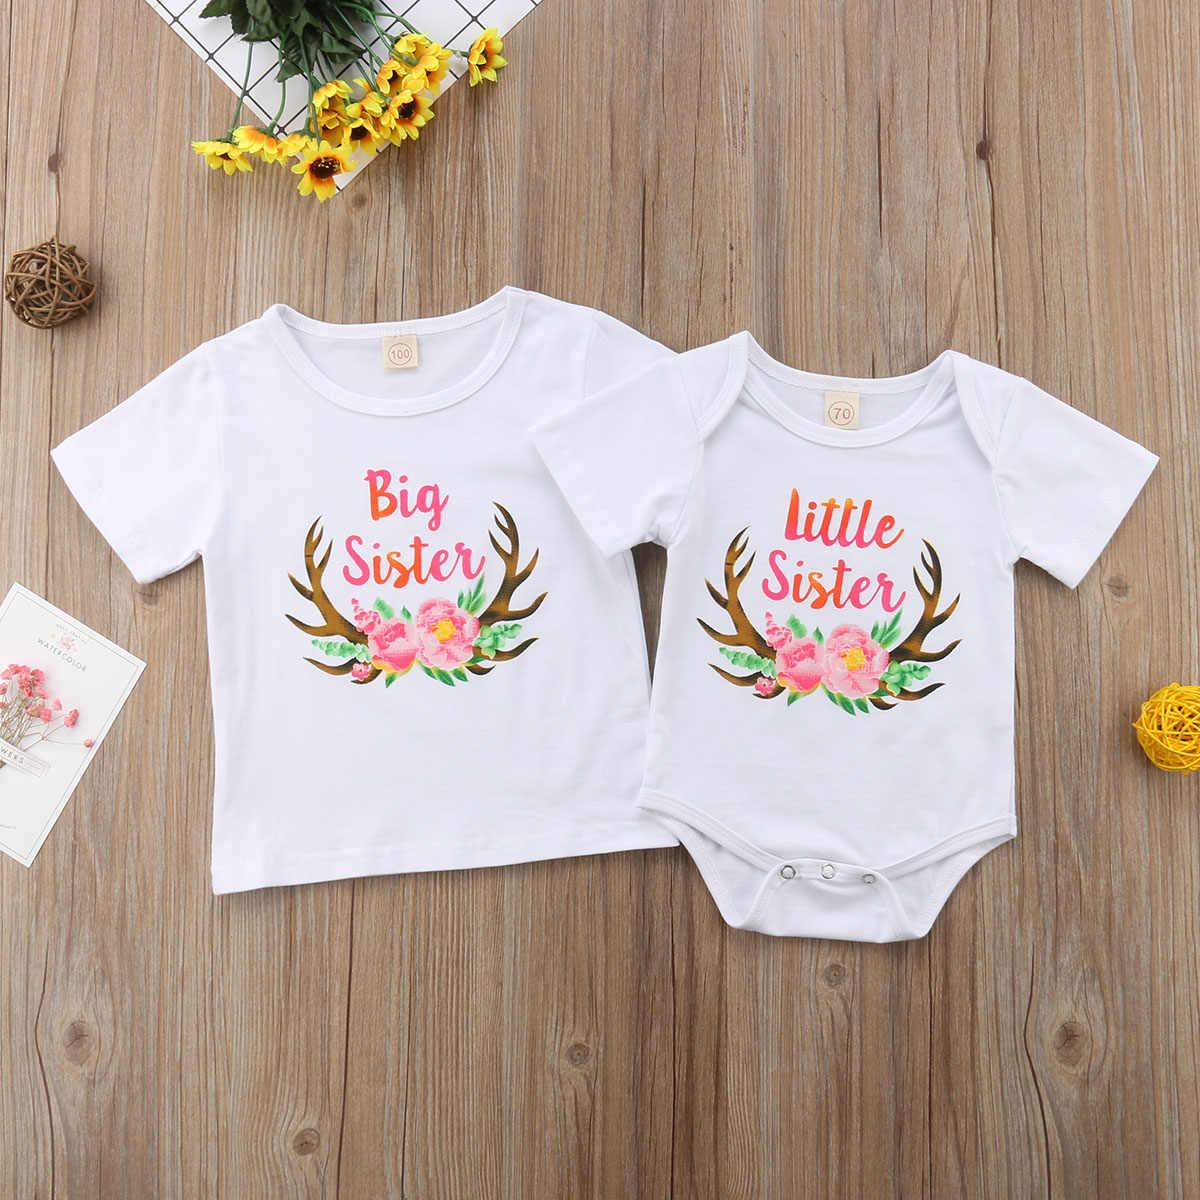 Семейная одежда с надписью «Big Sister» футболка Little Sister короткий  рукав Футболка комбинезон Детские e19d58e131a